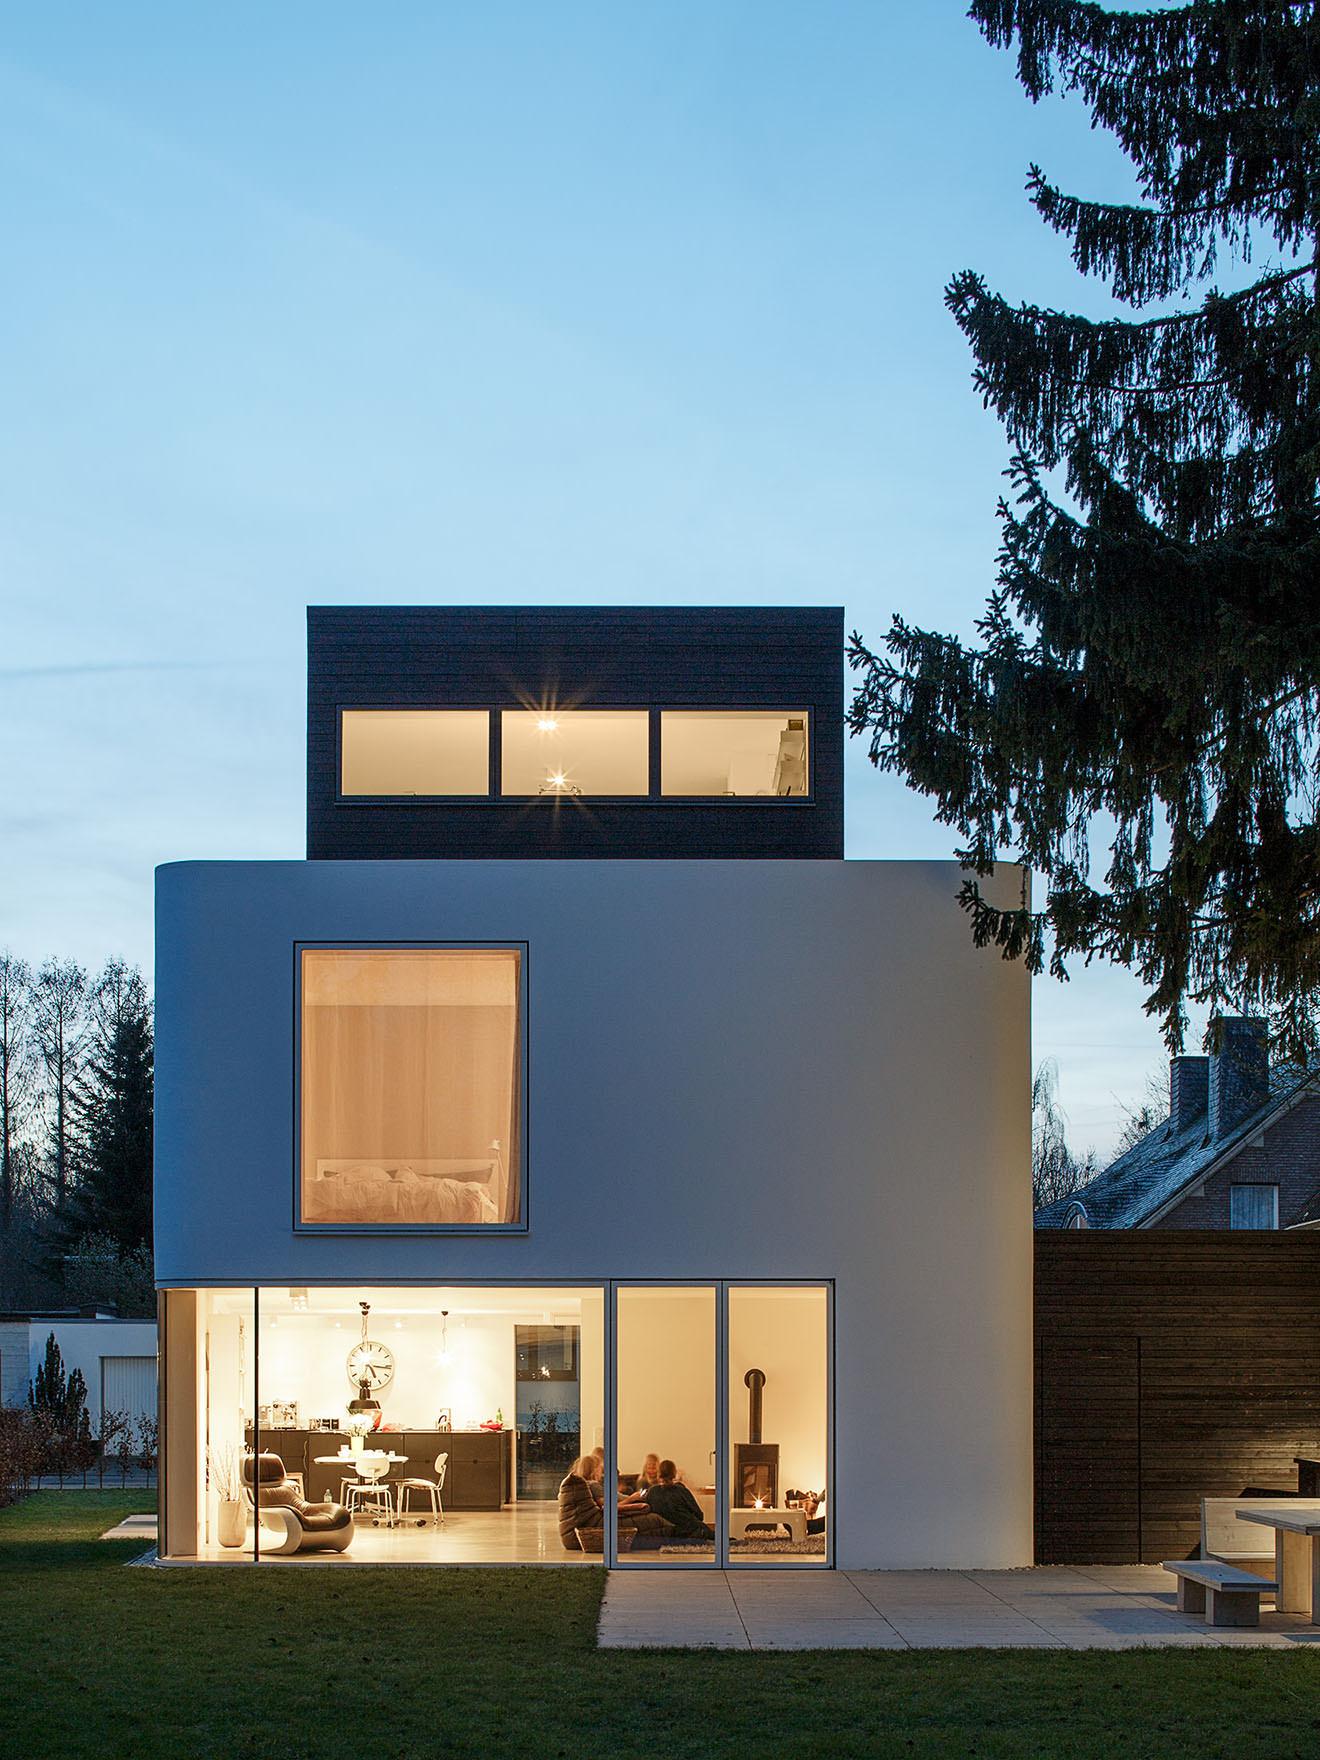 Privathaus Köln lV / Martin Falke Architekten / 2015 — FOTOGRAFIE ...